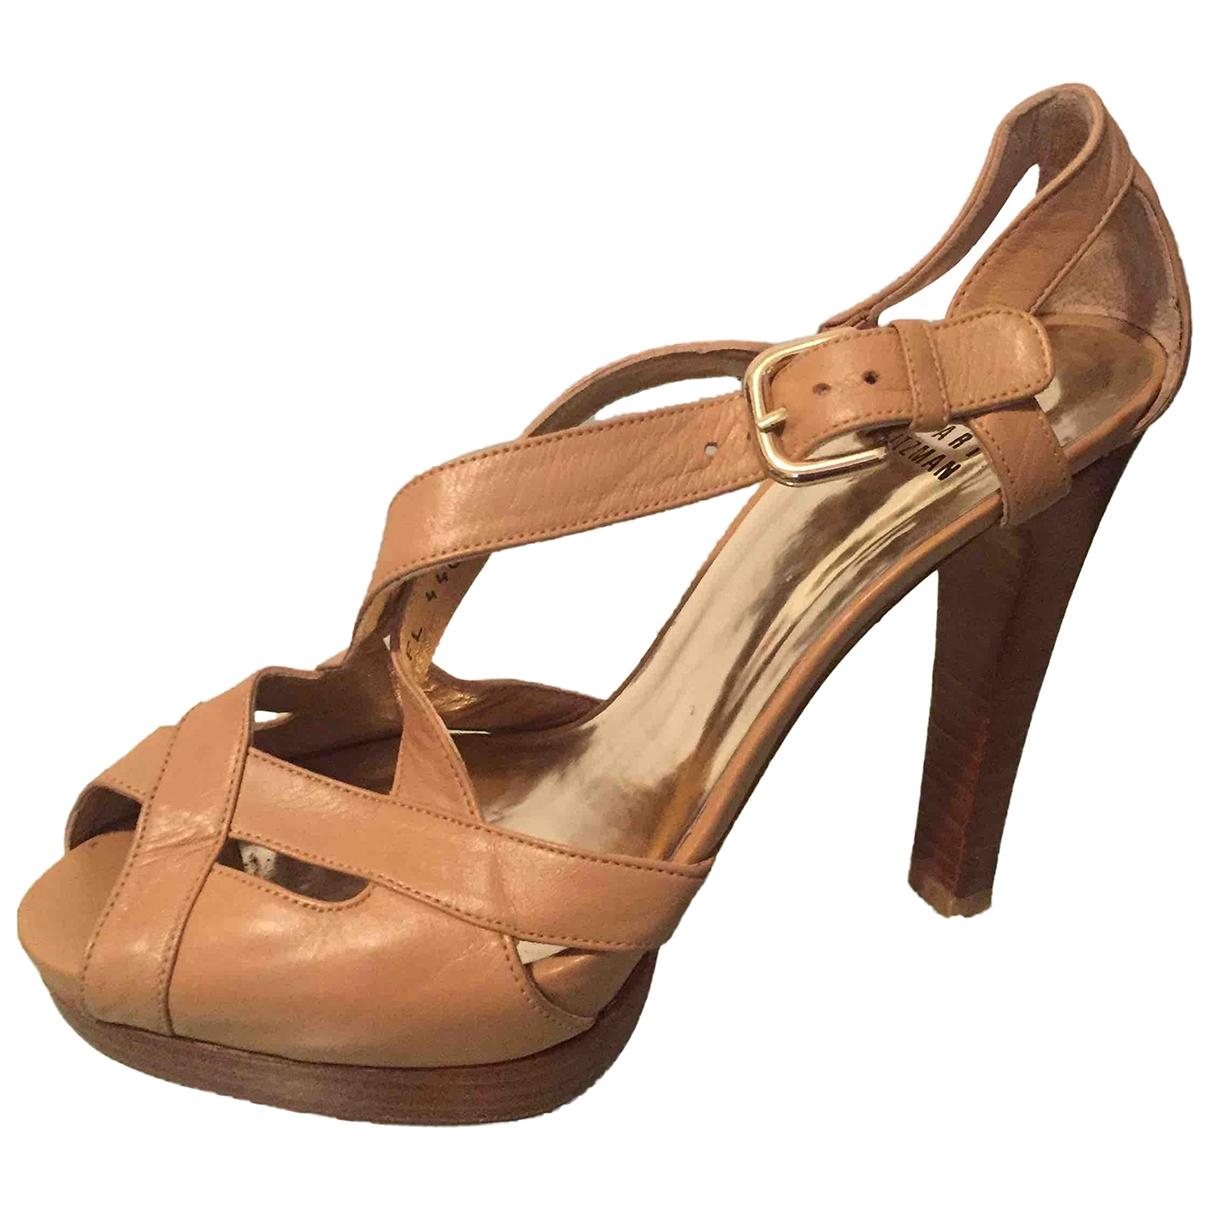 Stuart Weitzman \N Beige Leather Sandals for Women 37 EU